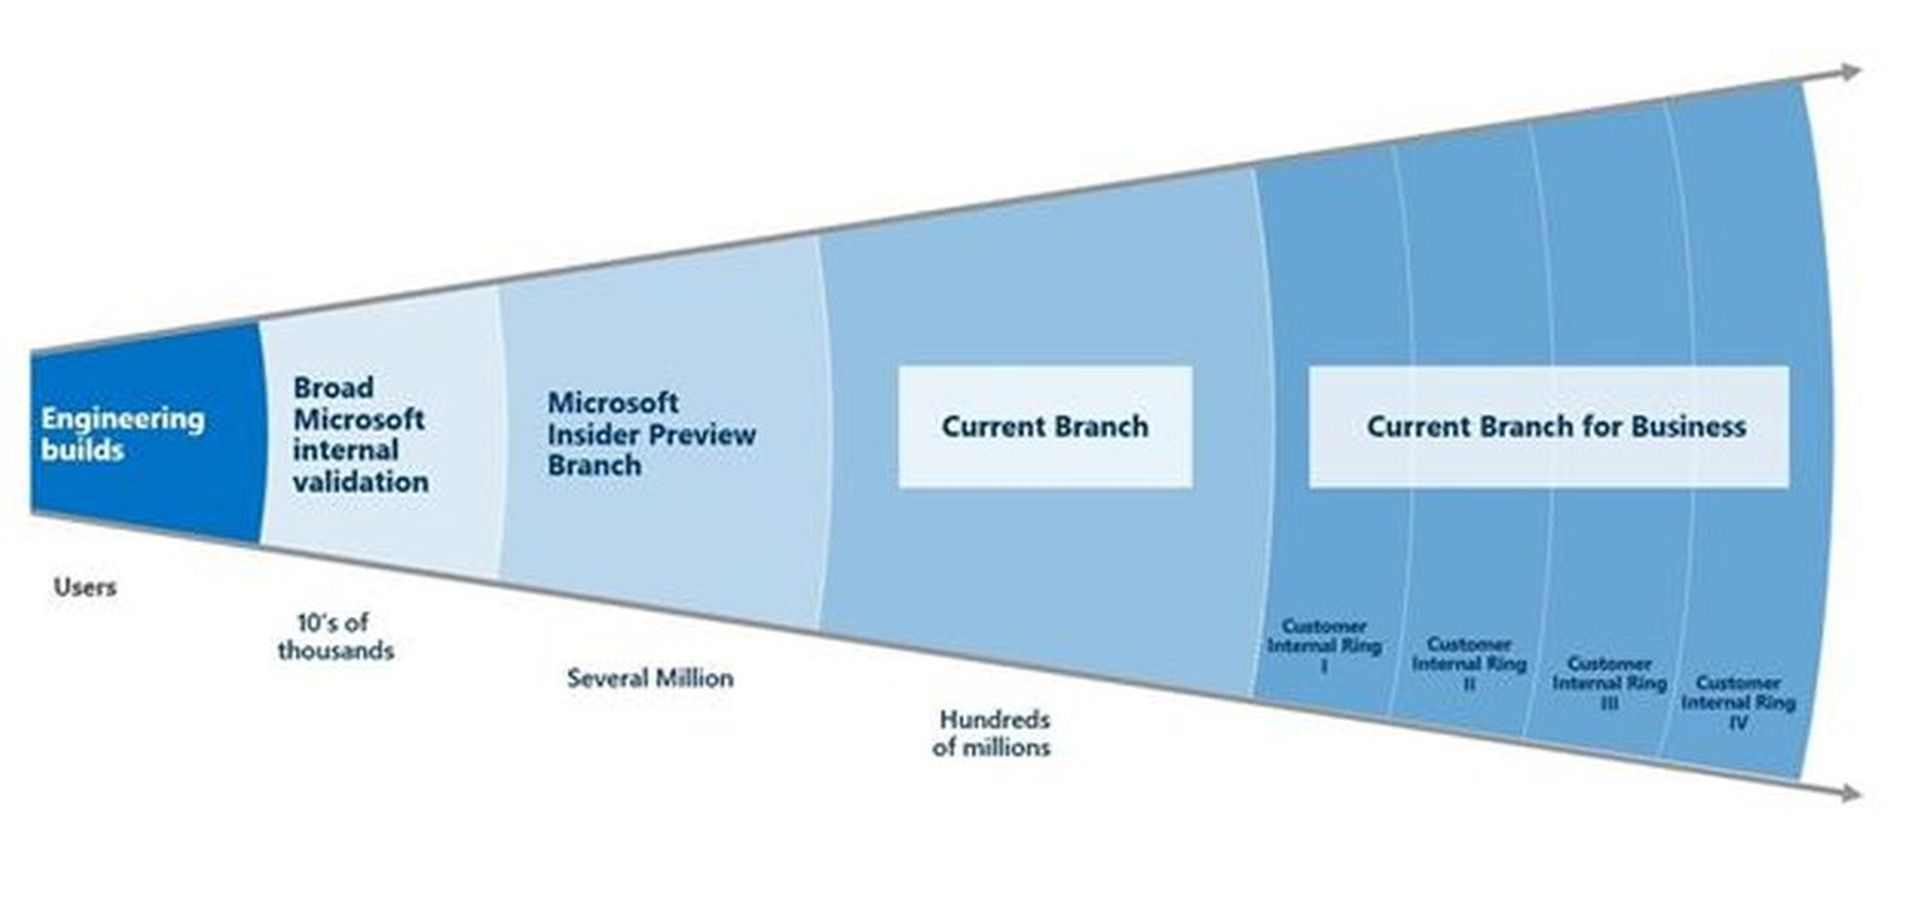 Windows 10 Service Branch diagram